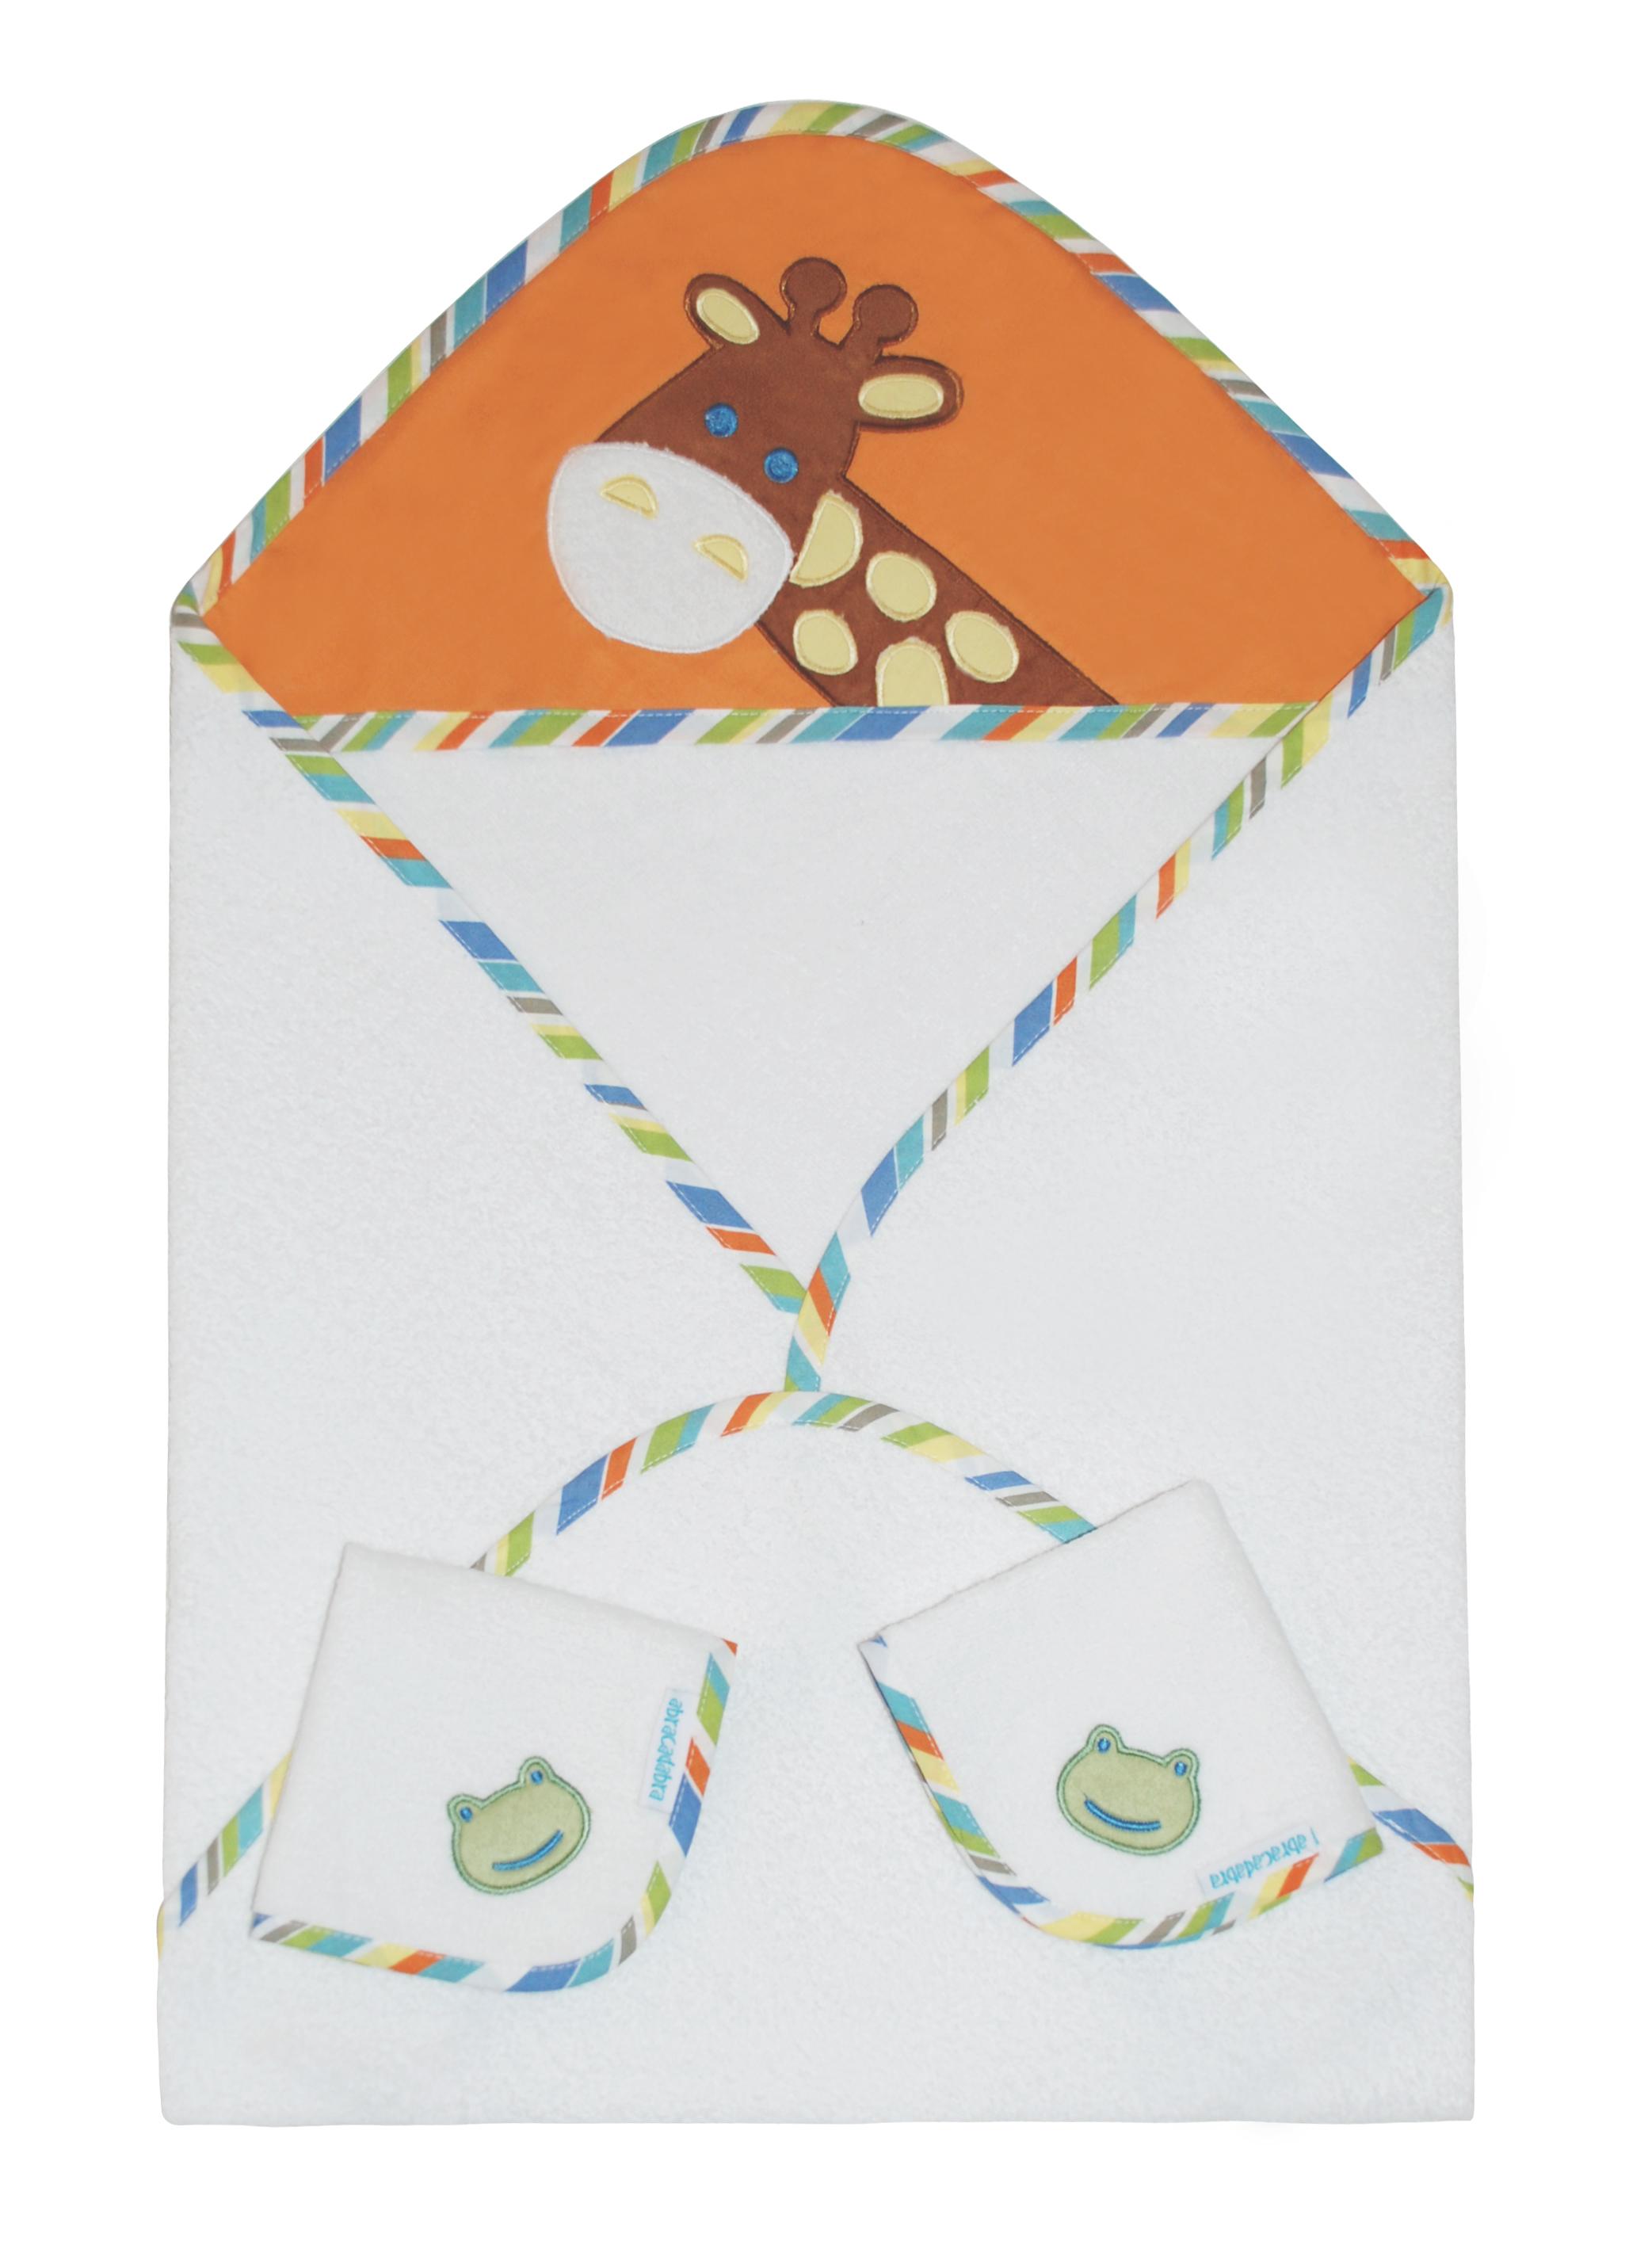 Mothercare | Abracadabra Hooded Towel Set - Head & Tail